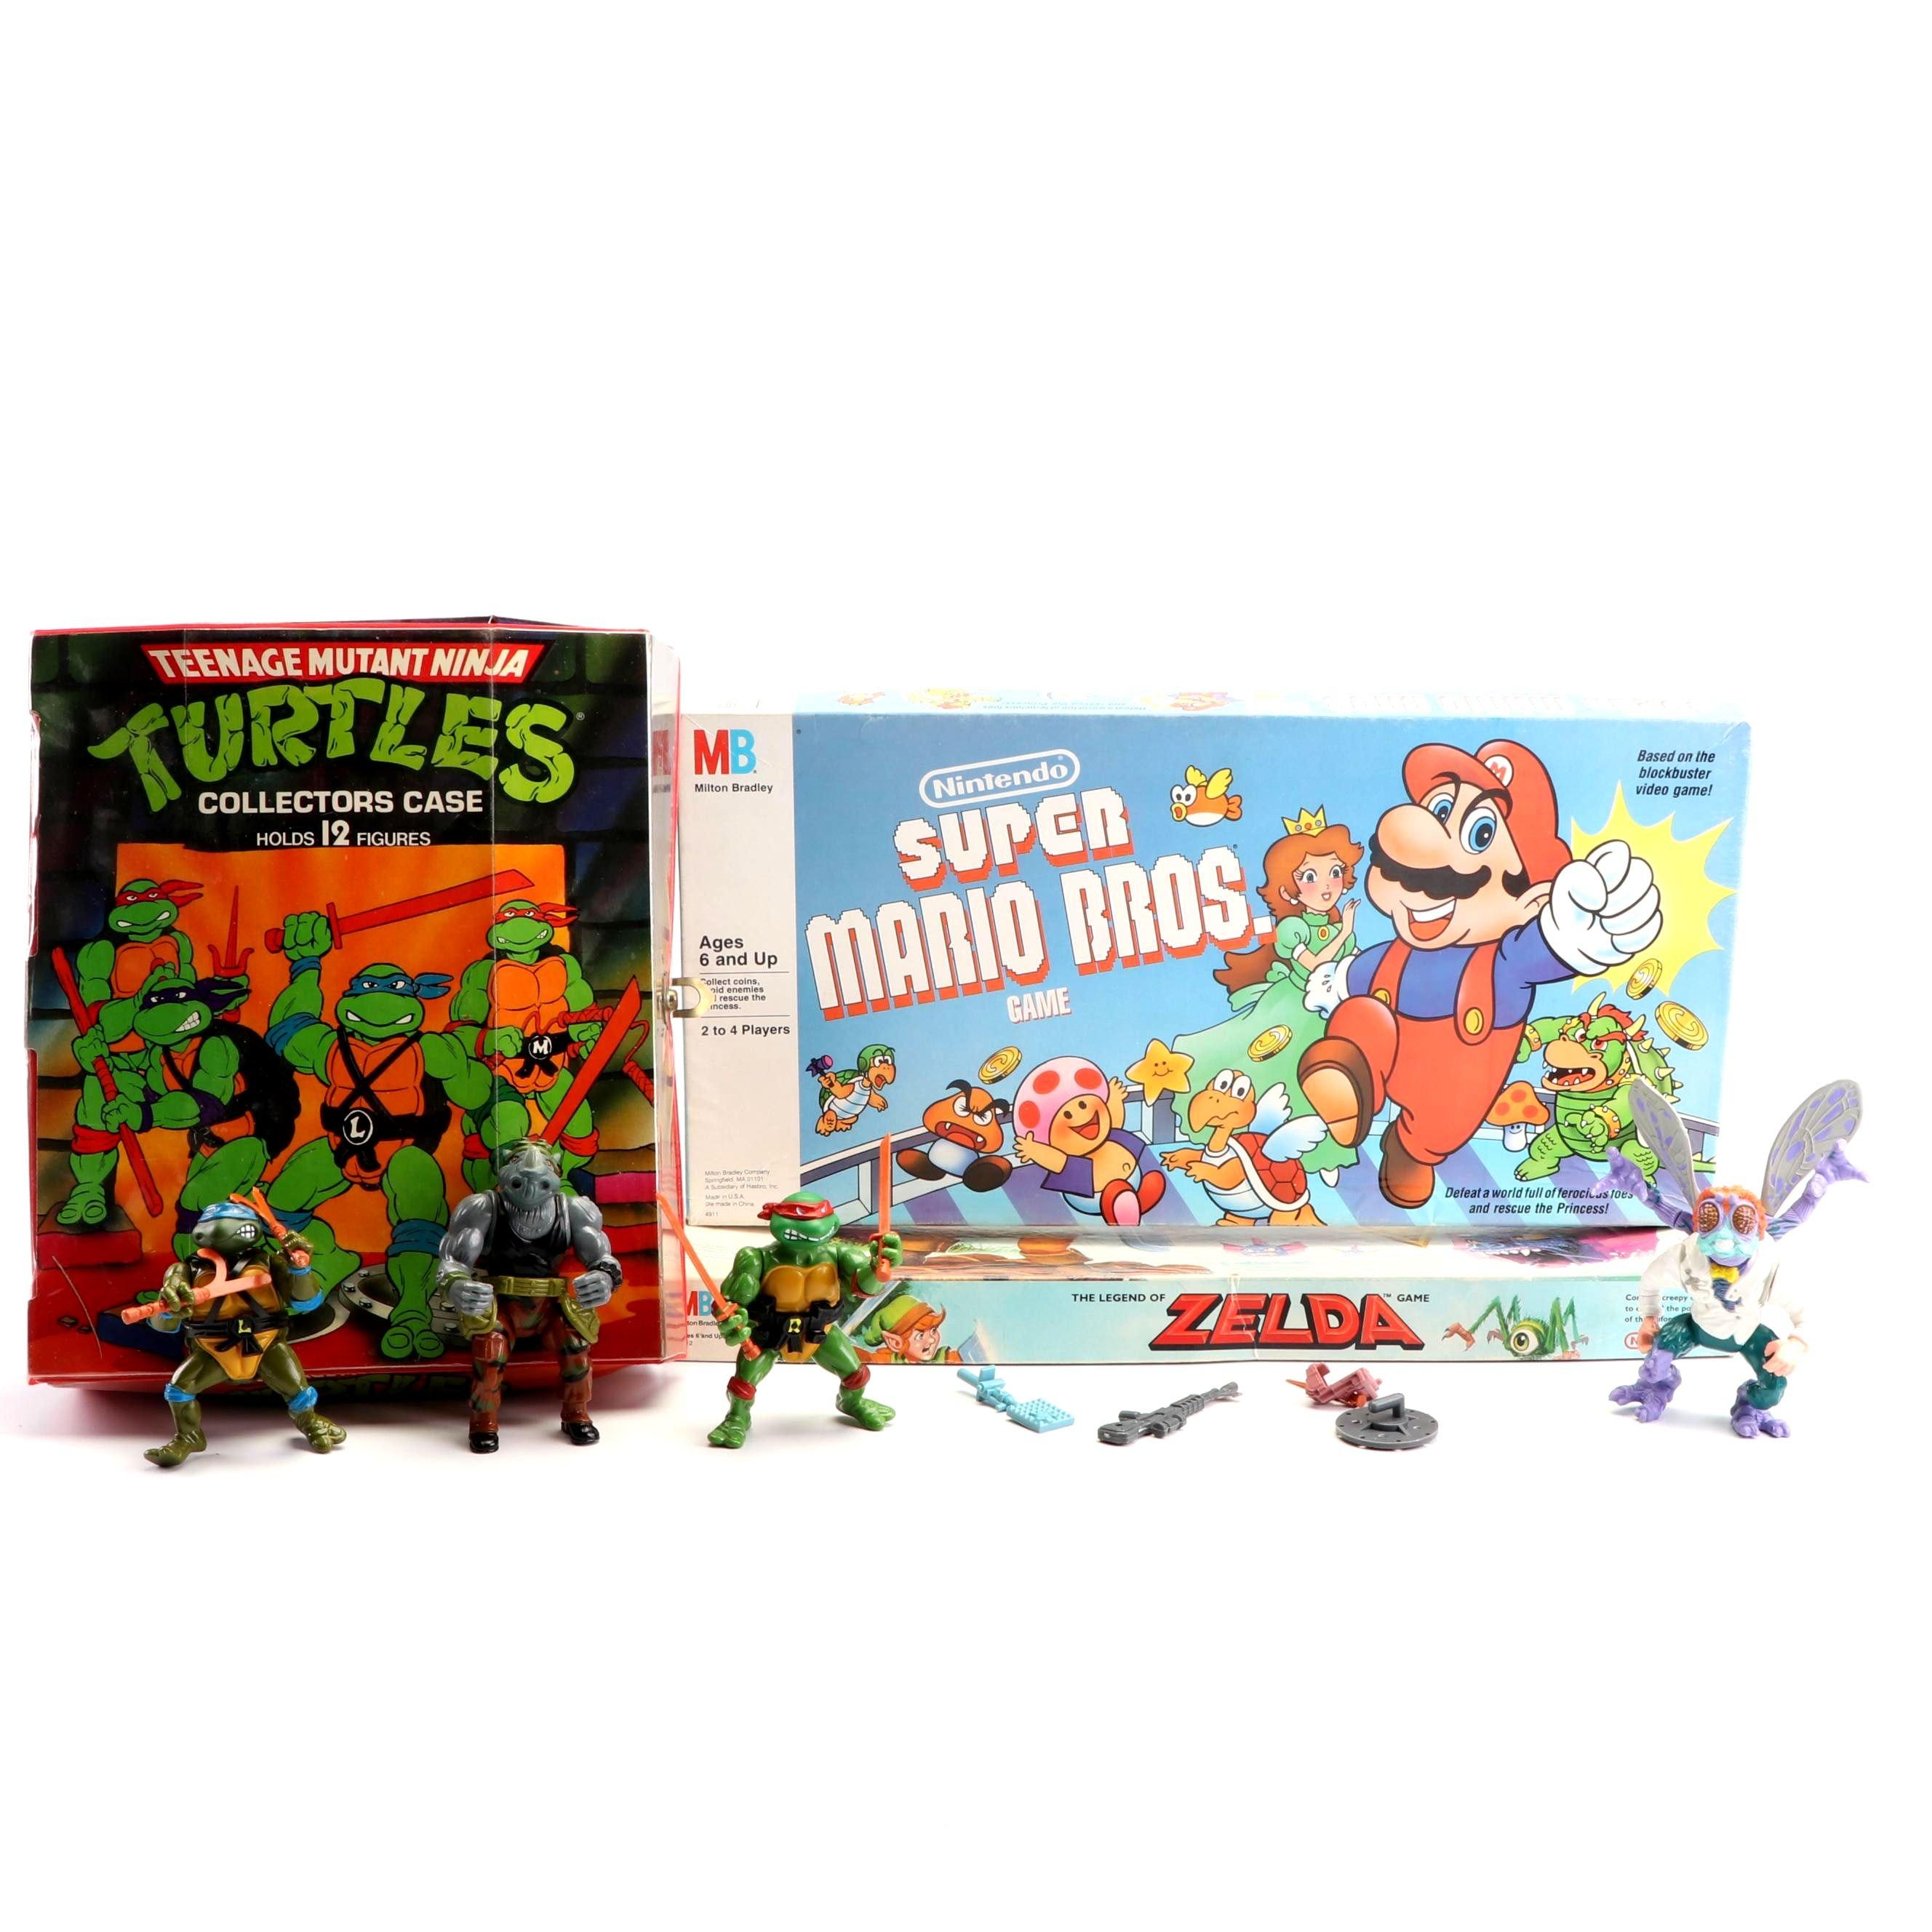 Nintendo Board Games and Teenage Mutant Ninja Turtles Case and Figures, 1980s